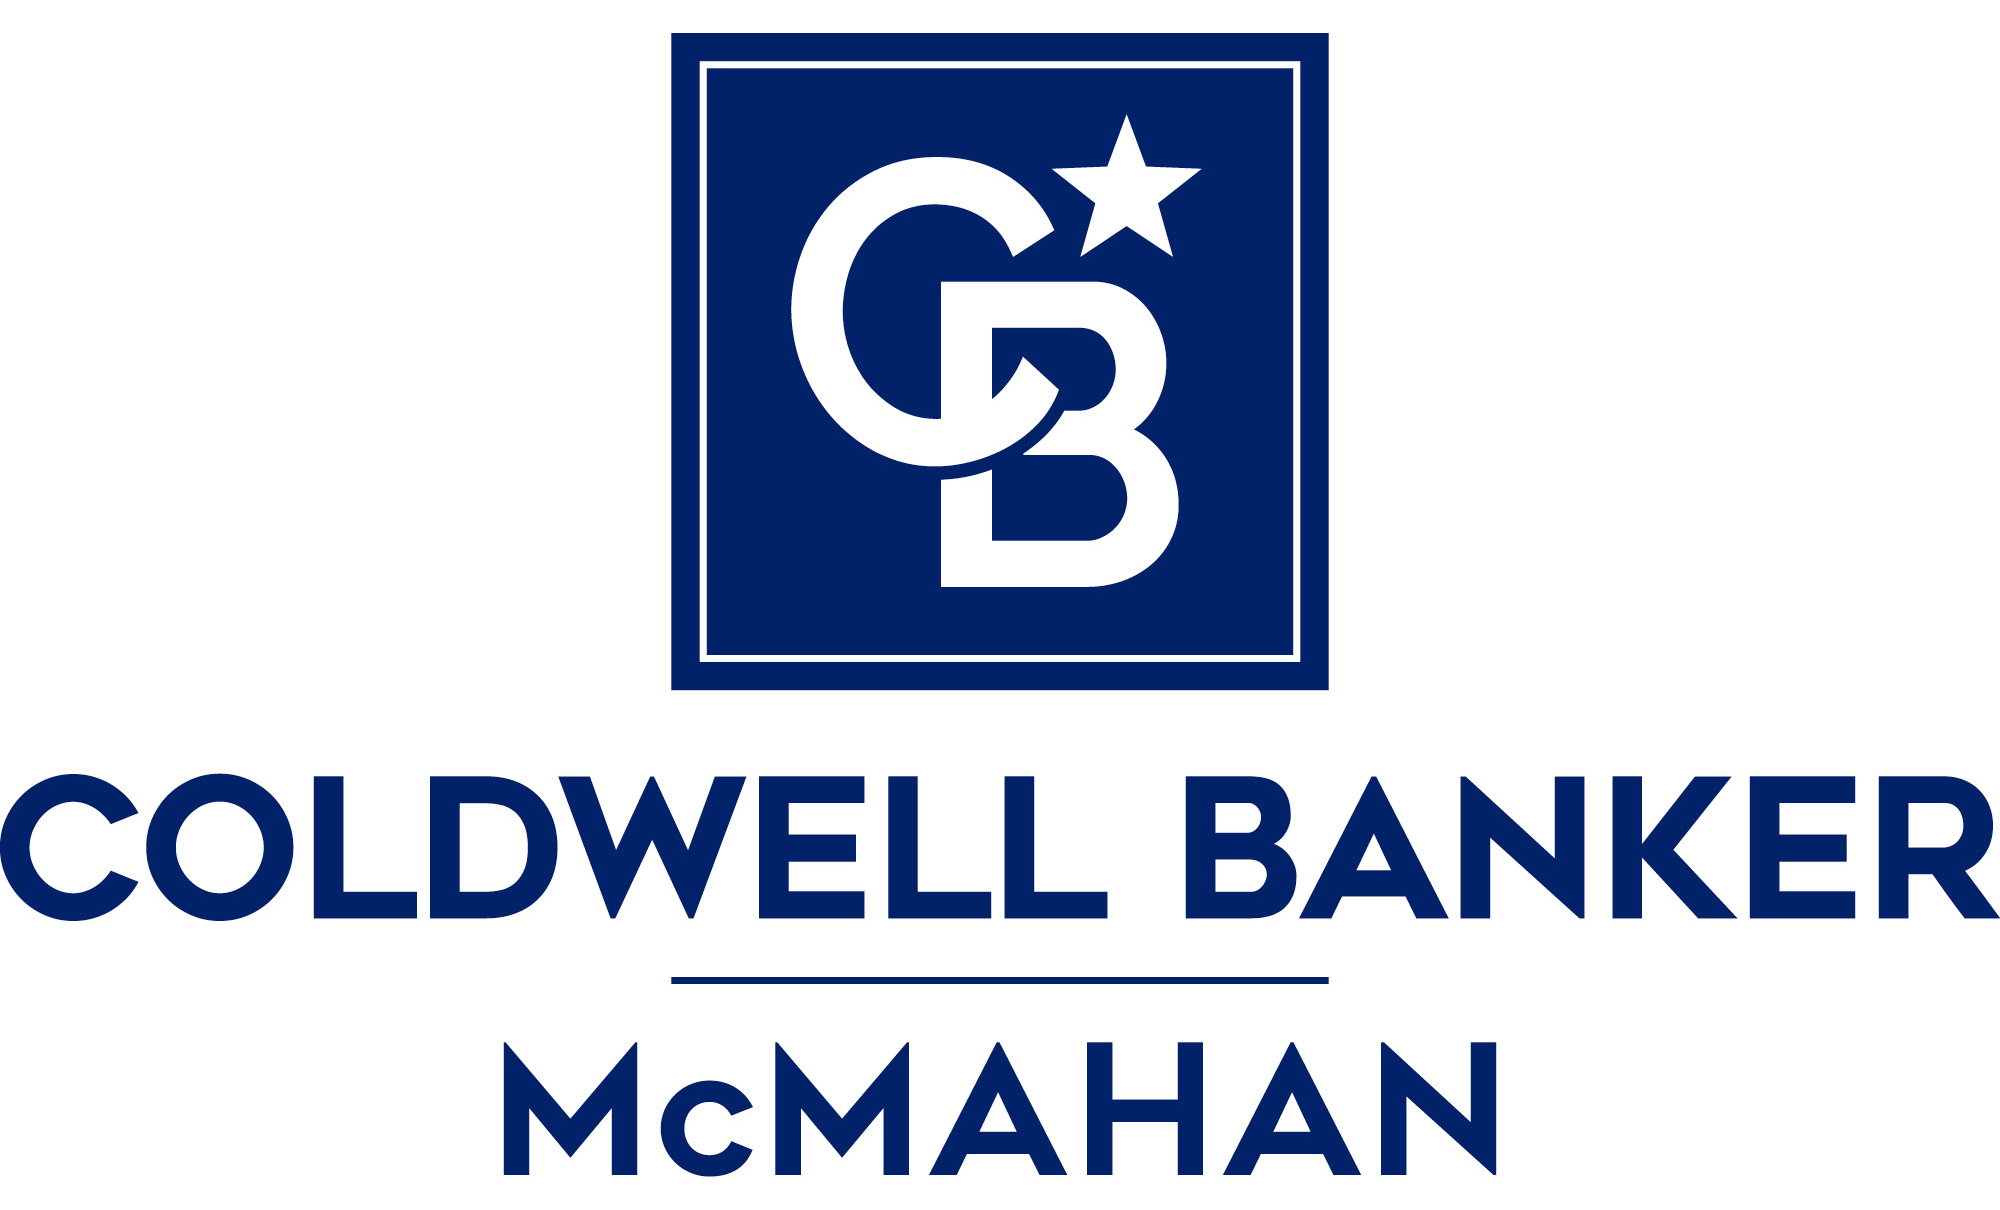 Gina Locke - Coldwell Banker McMahan Logo